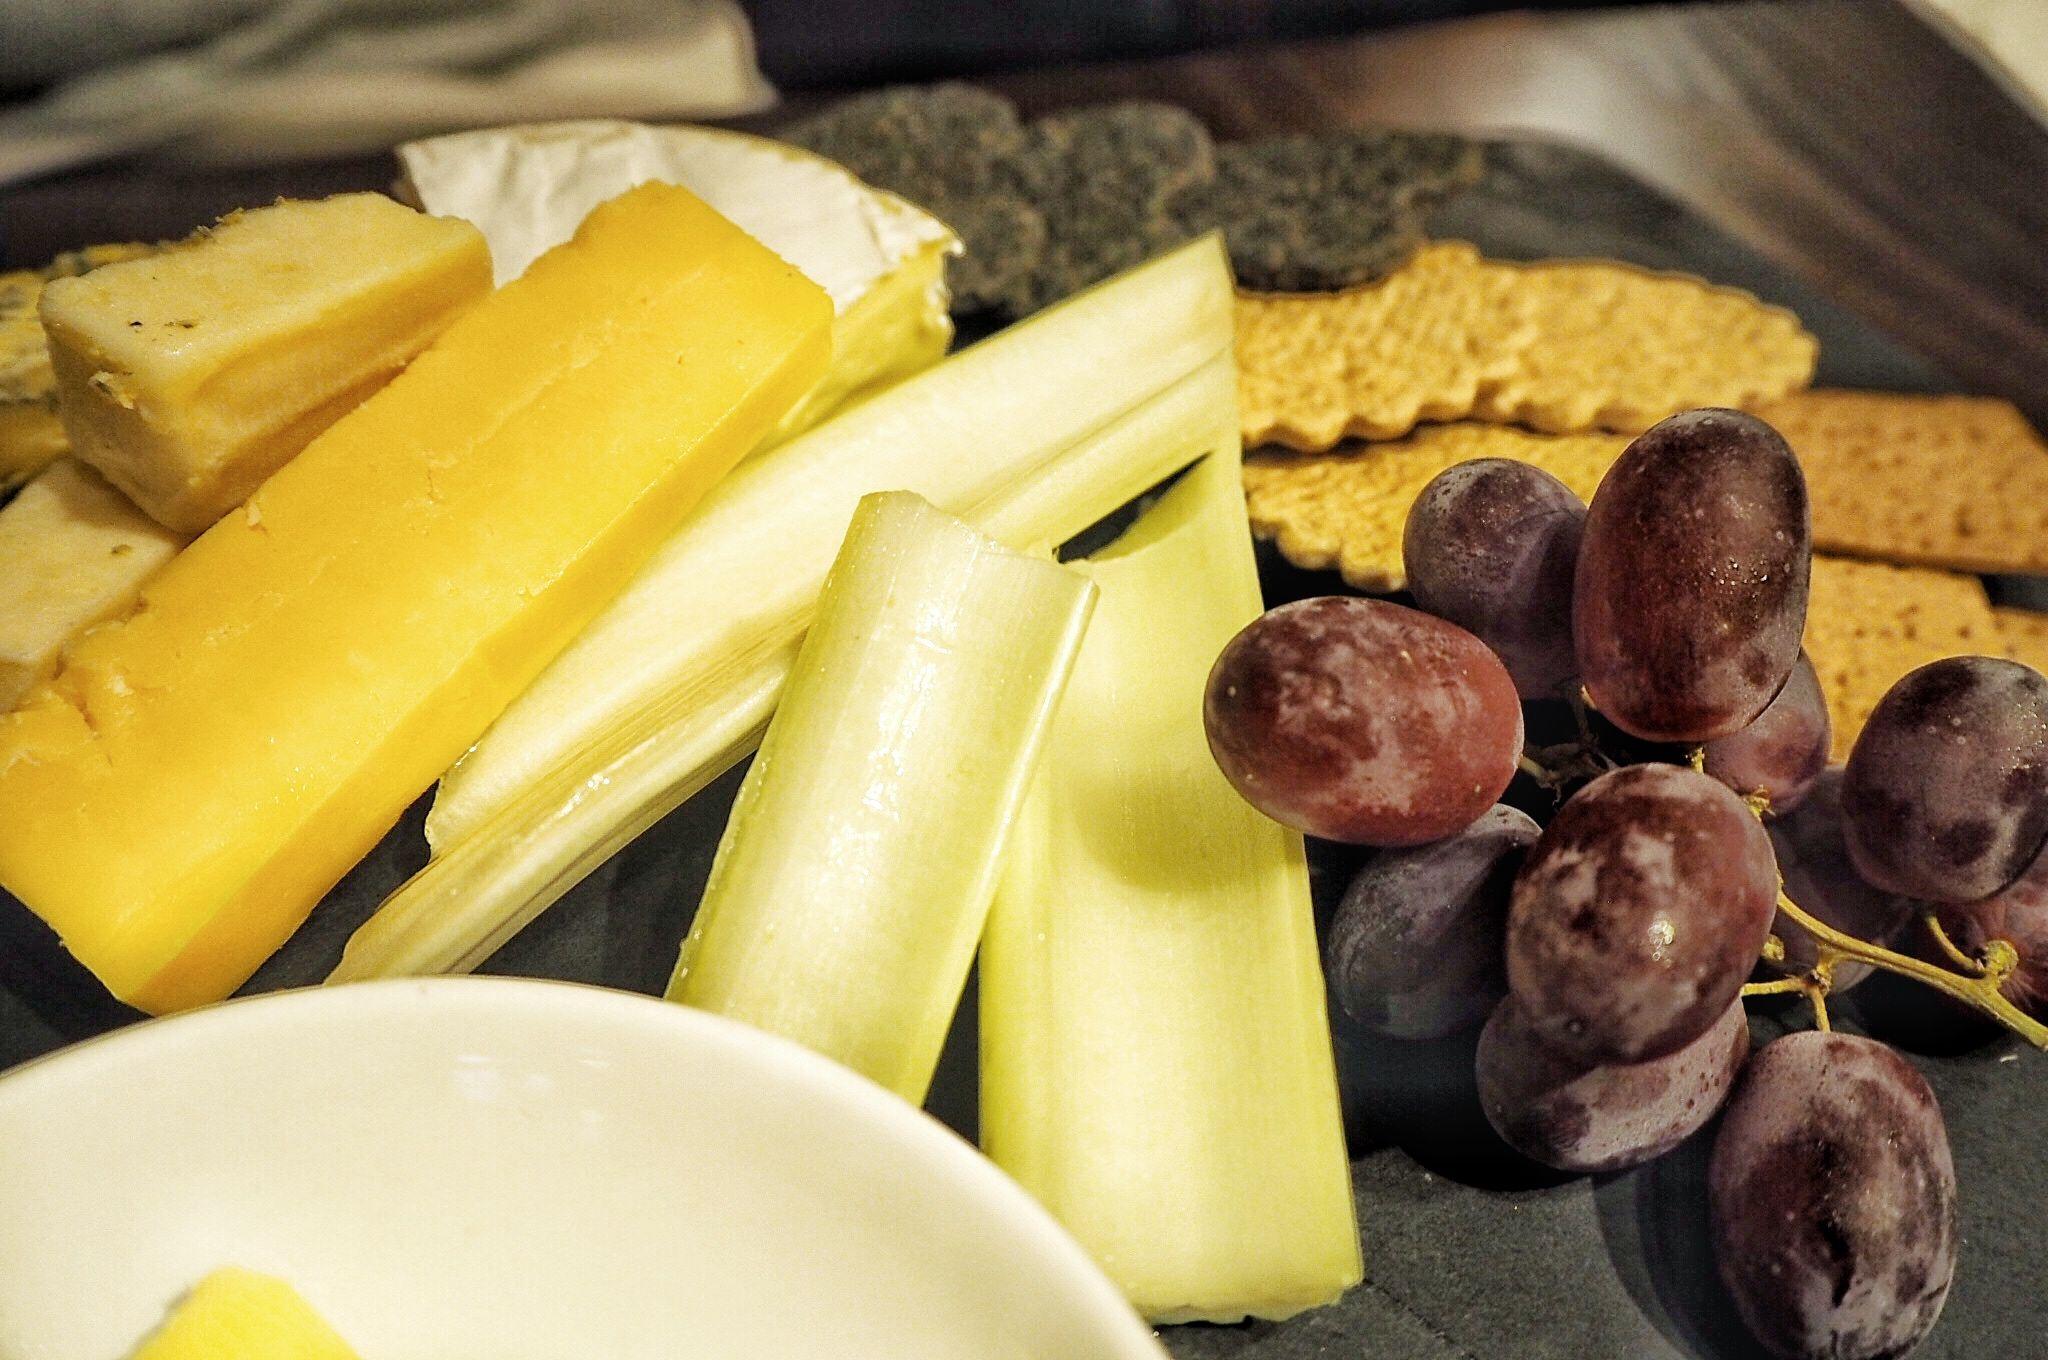 Cheese board Miller and Carter Milton Keynes Restaurant